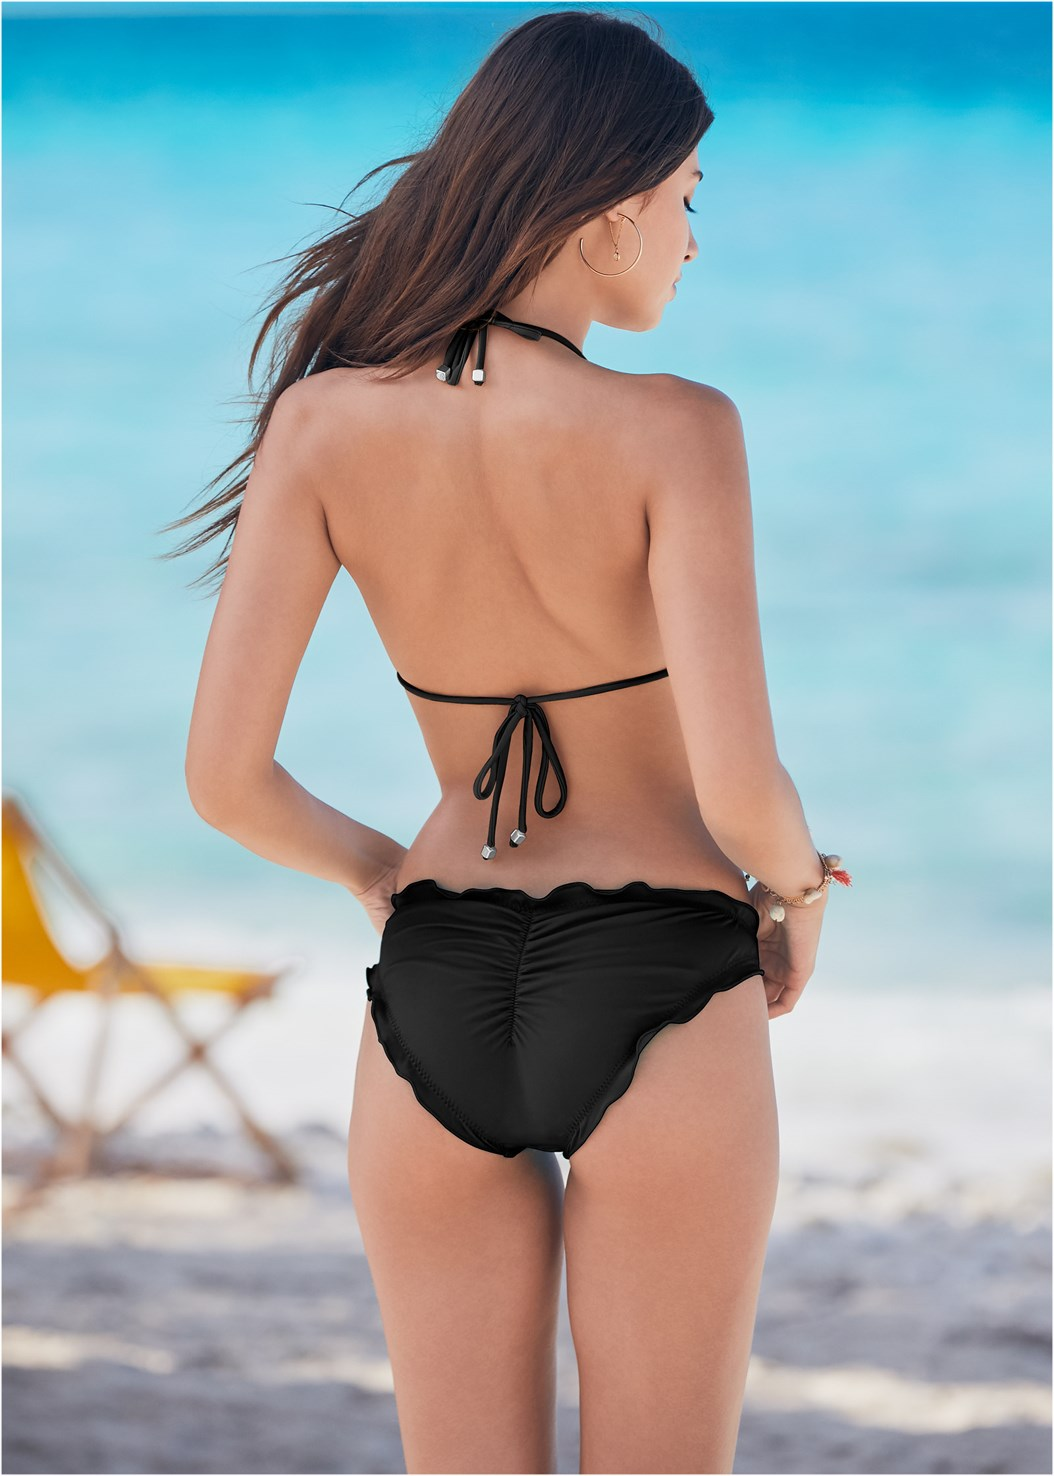 Ruffle Scrunch Back Bottom,Triangle String Bikini Top,Enhancer Push Up Ring Halter Triangle Top